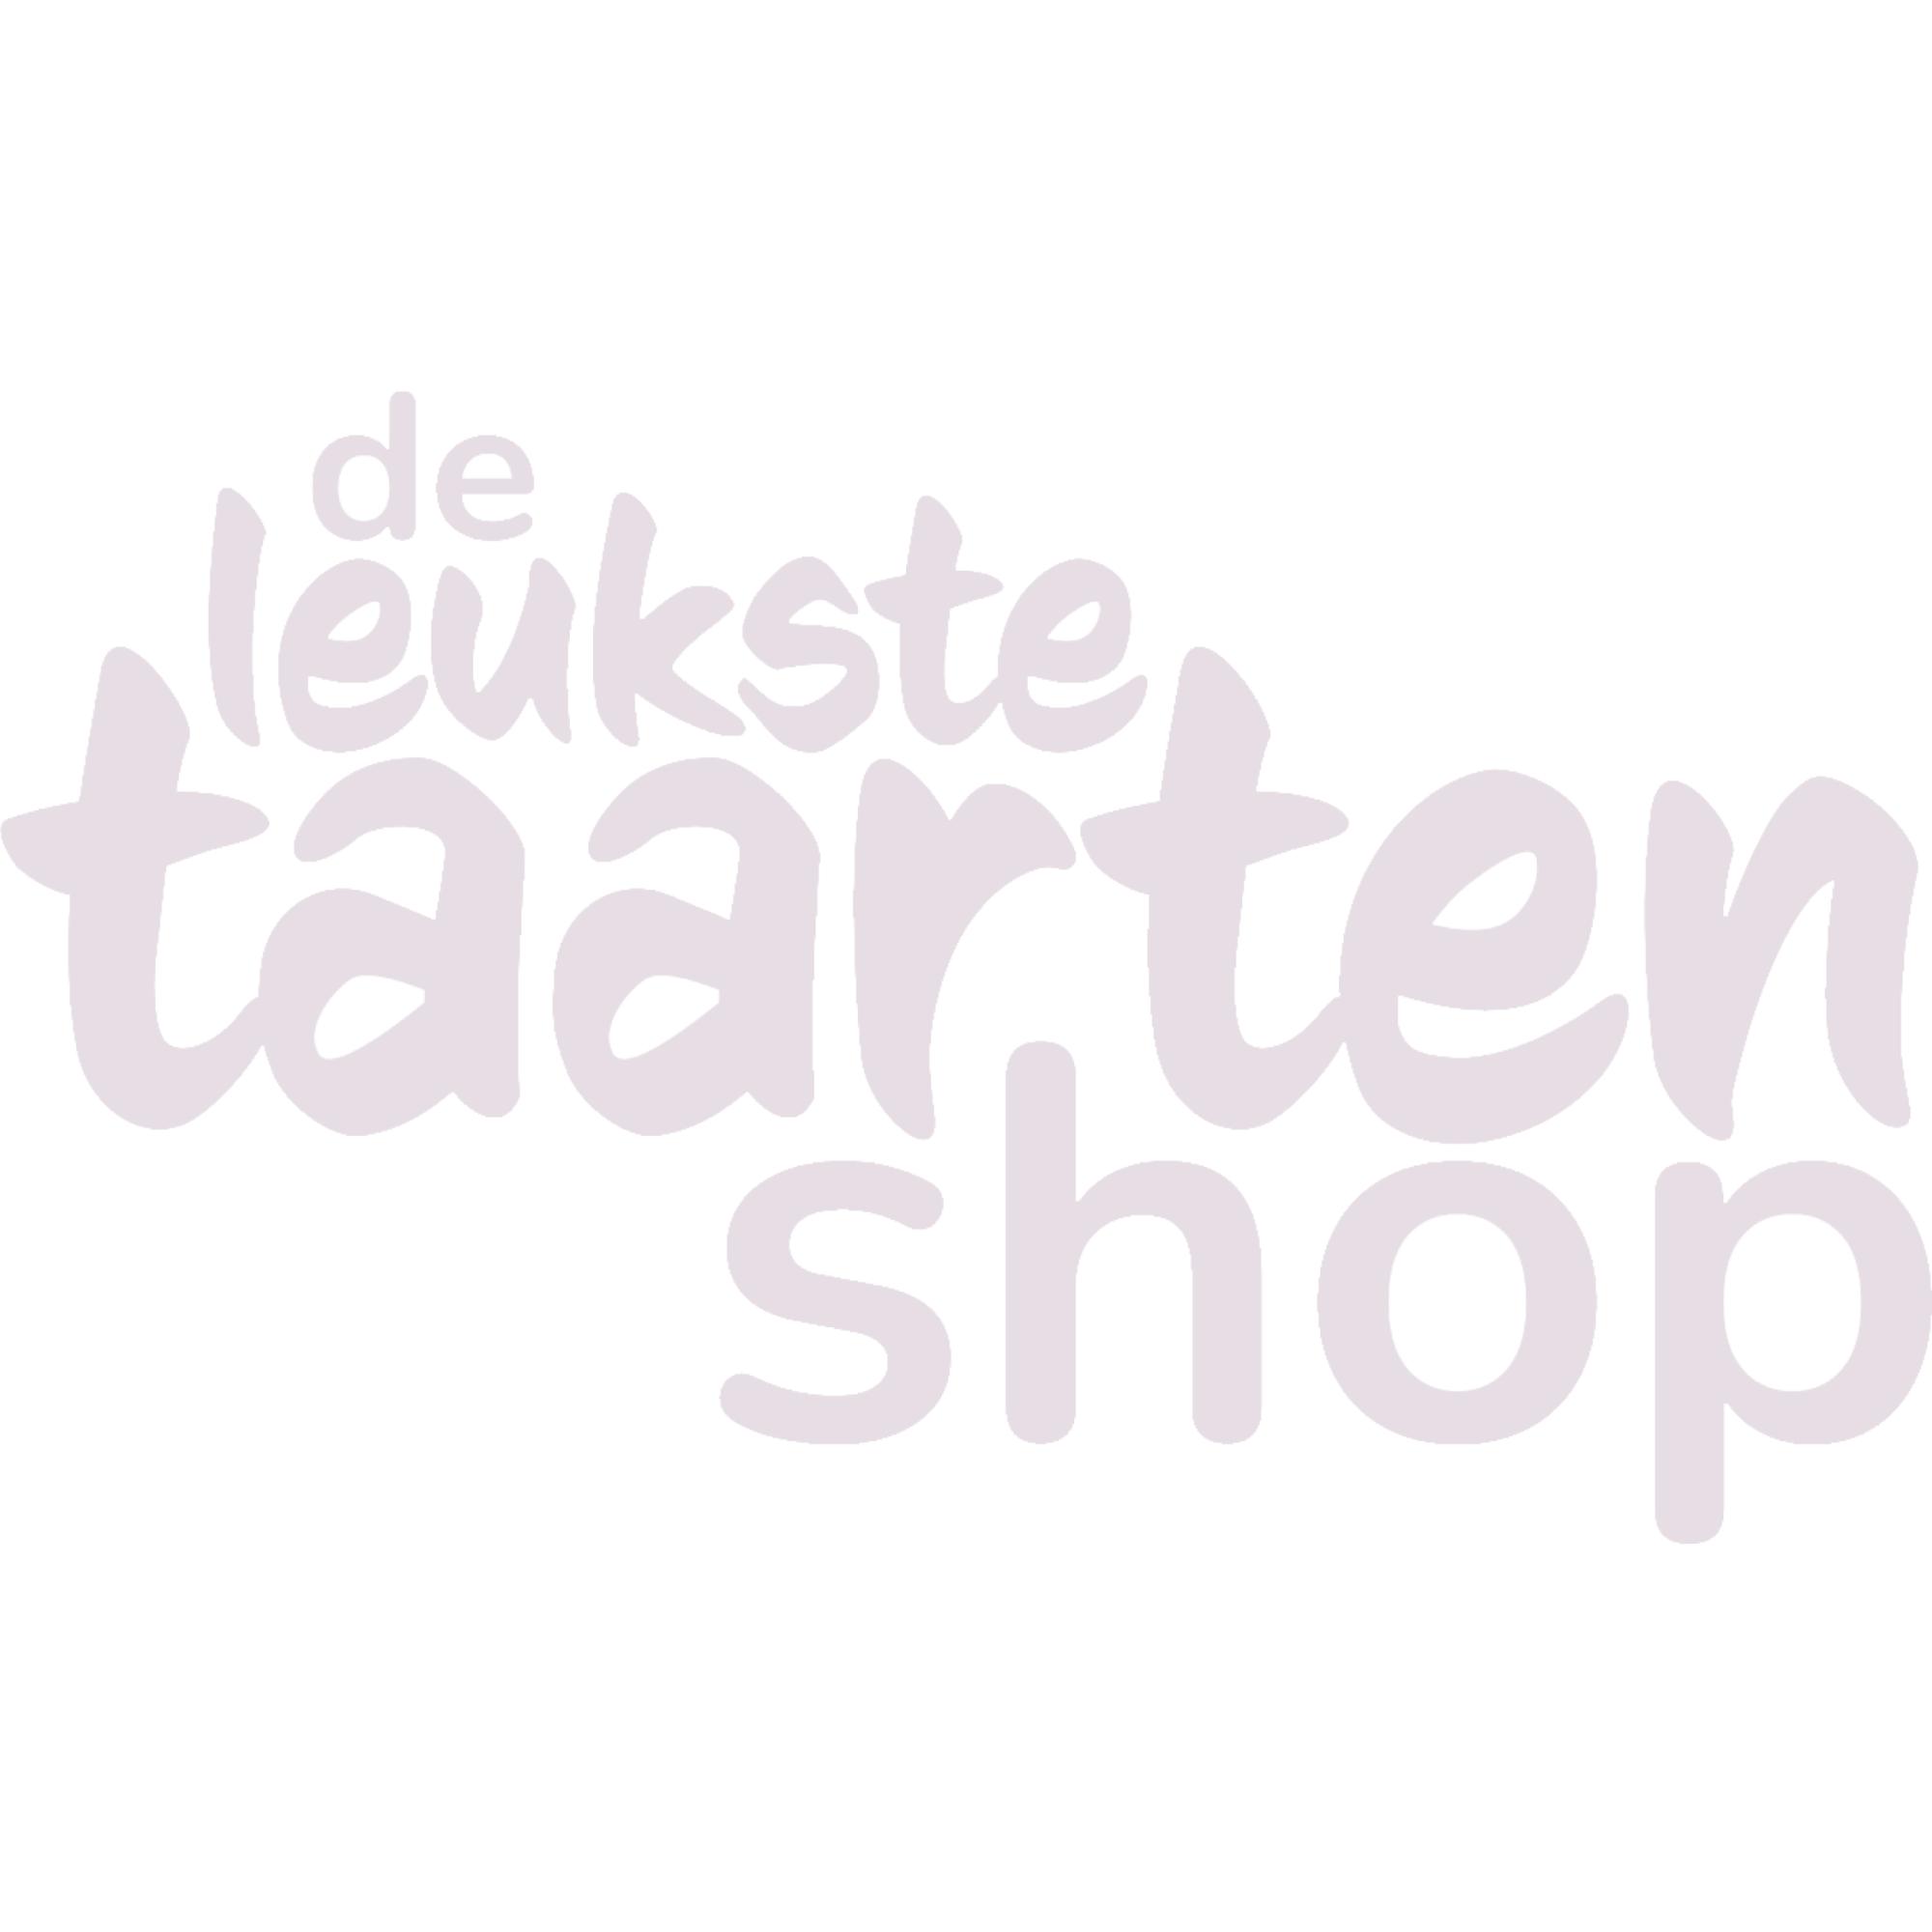 http://www.deleukstetaartenshop.nl/media/catalog/product/cache/1/image/304x304/9df78eab33525d08d6e5fb8d27136e95/5/7/5741-0400_16.jpg